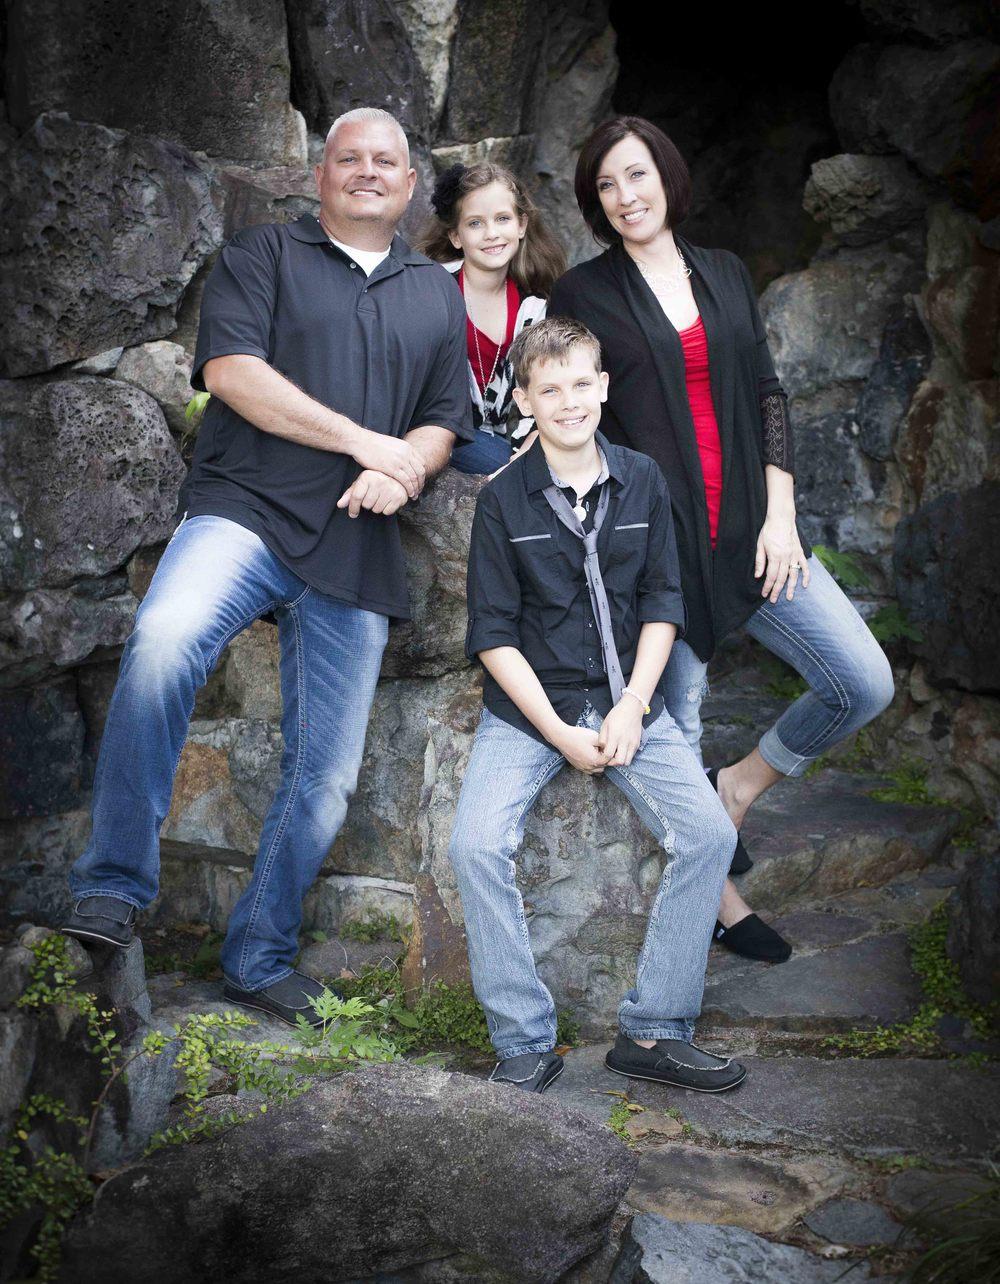 Family Portrait, Goldsboro NC Photographer